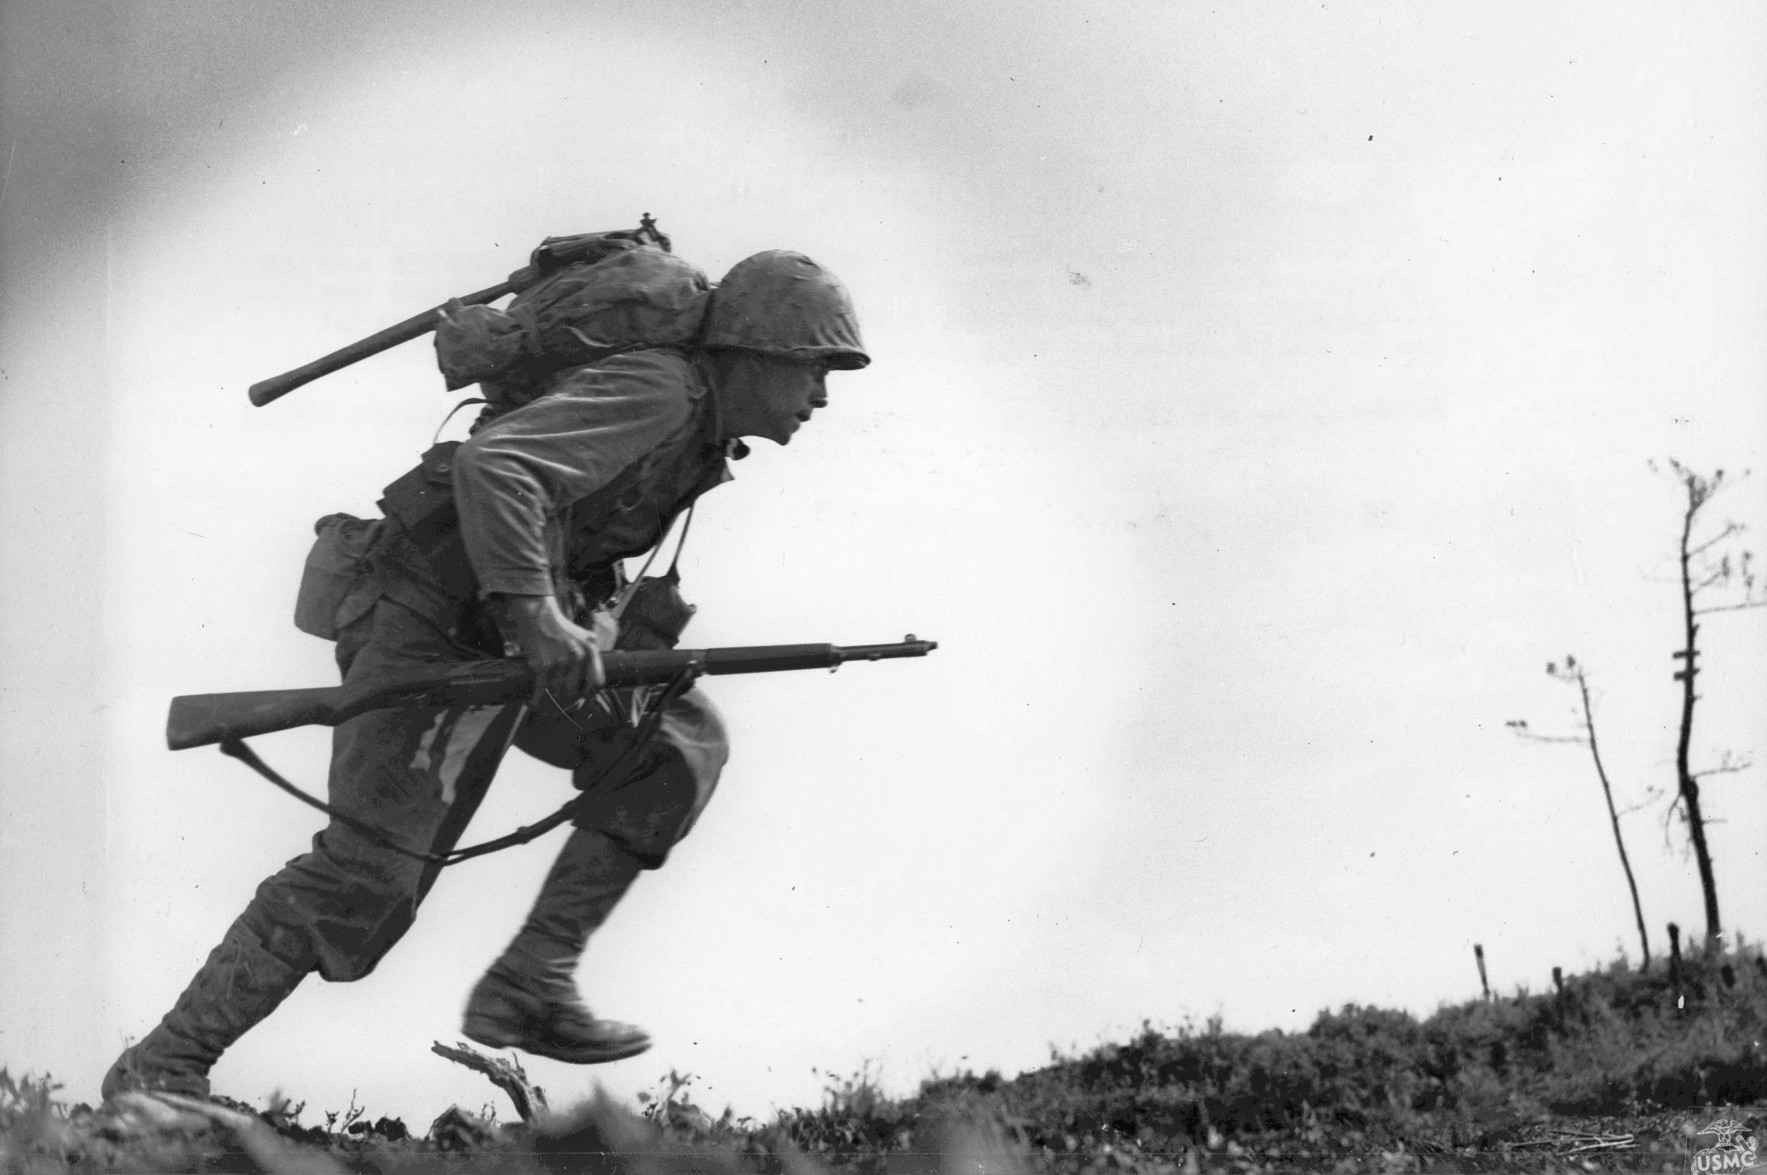 Battle of Okinawa 75th Anniversary Commemoration image